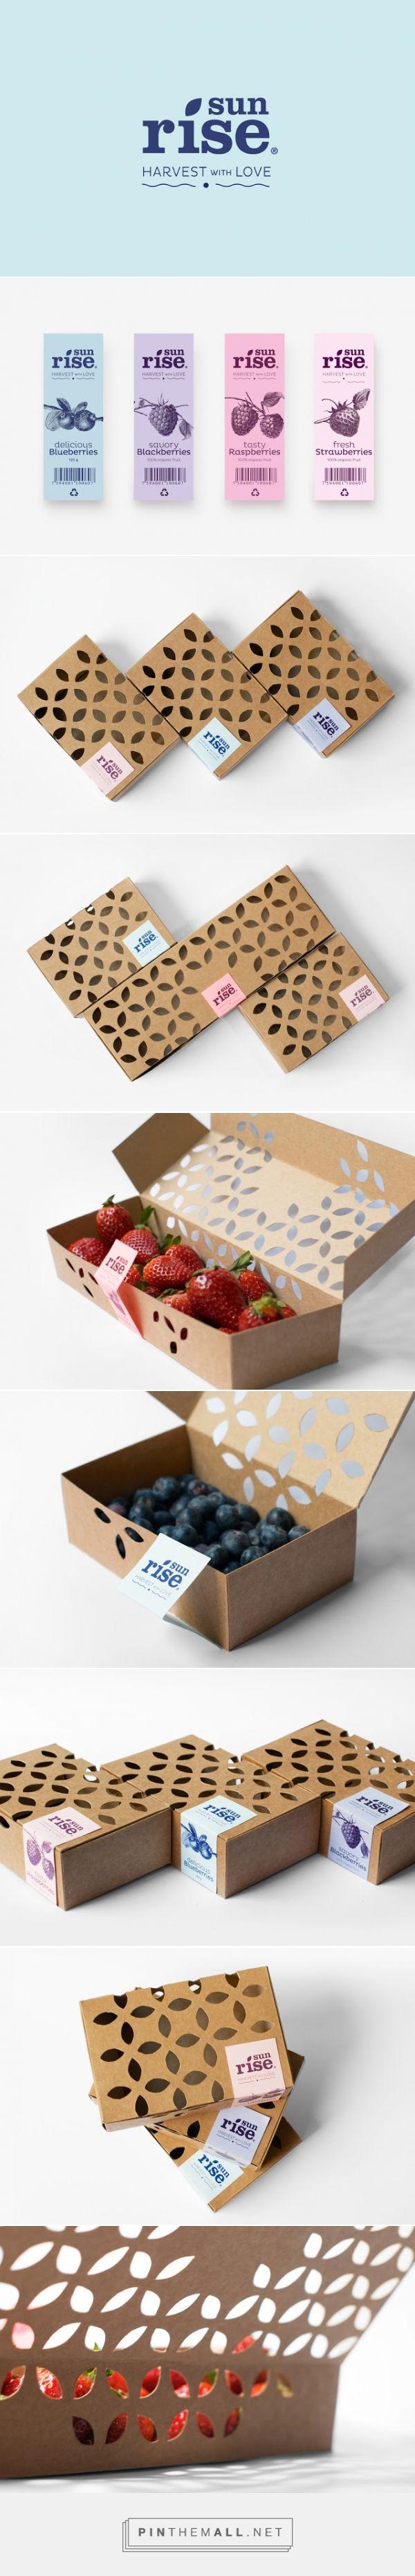 Sunrise #concept #fruits #packaging by Silvia Albertí, María Duriana Rodríguez & Diego Frayle - http://www.packagingoftheworld.com/2014/12/sunrise-student-project.html